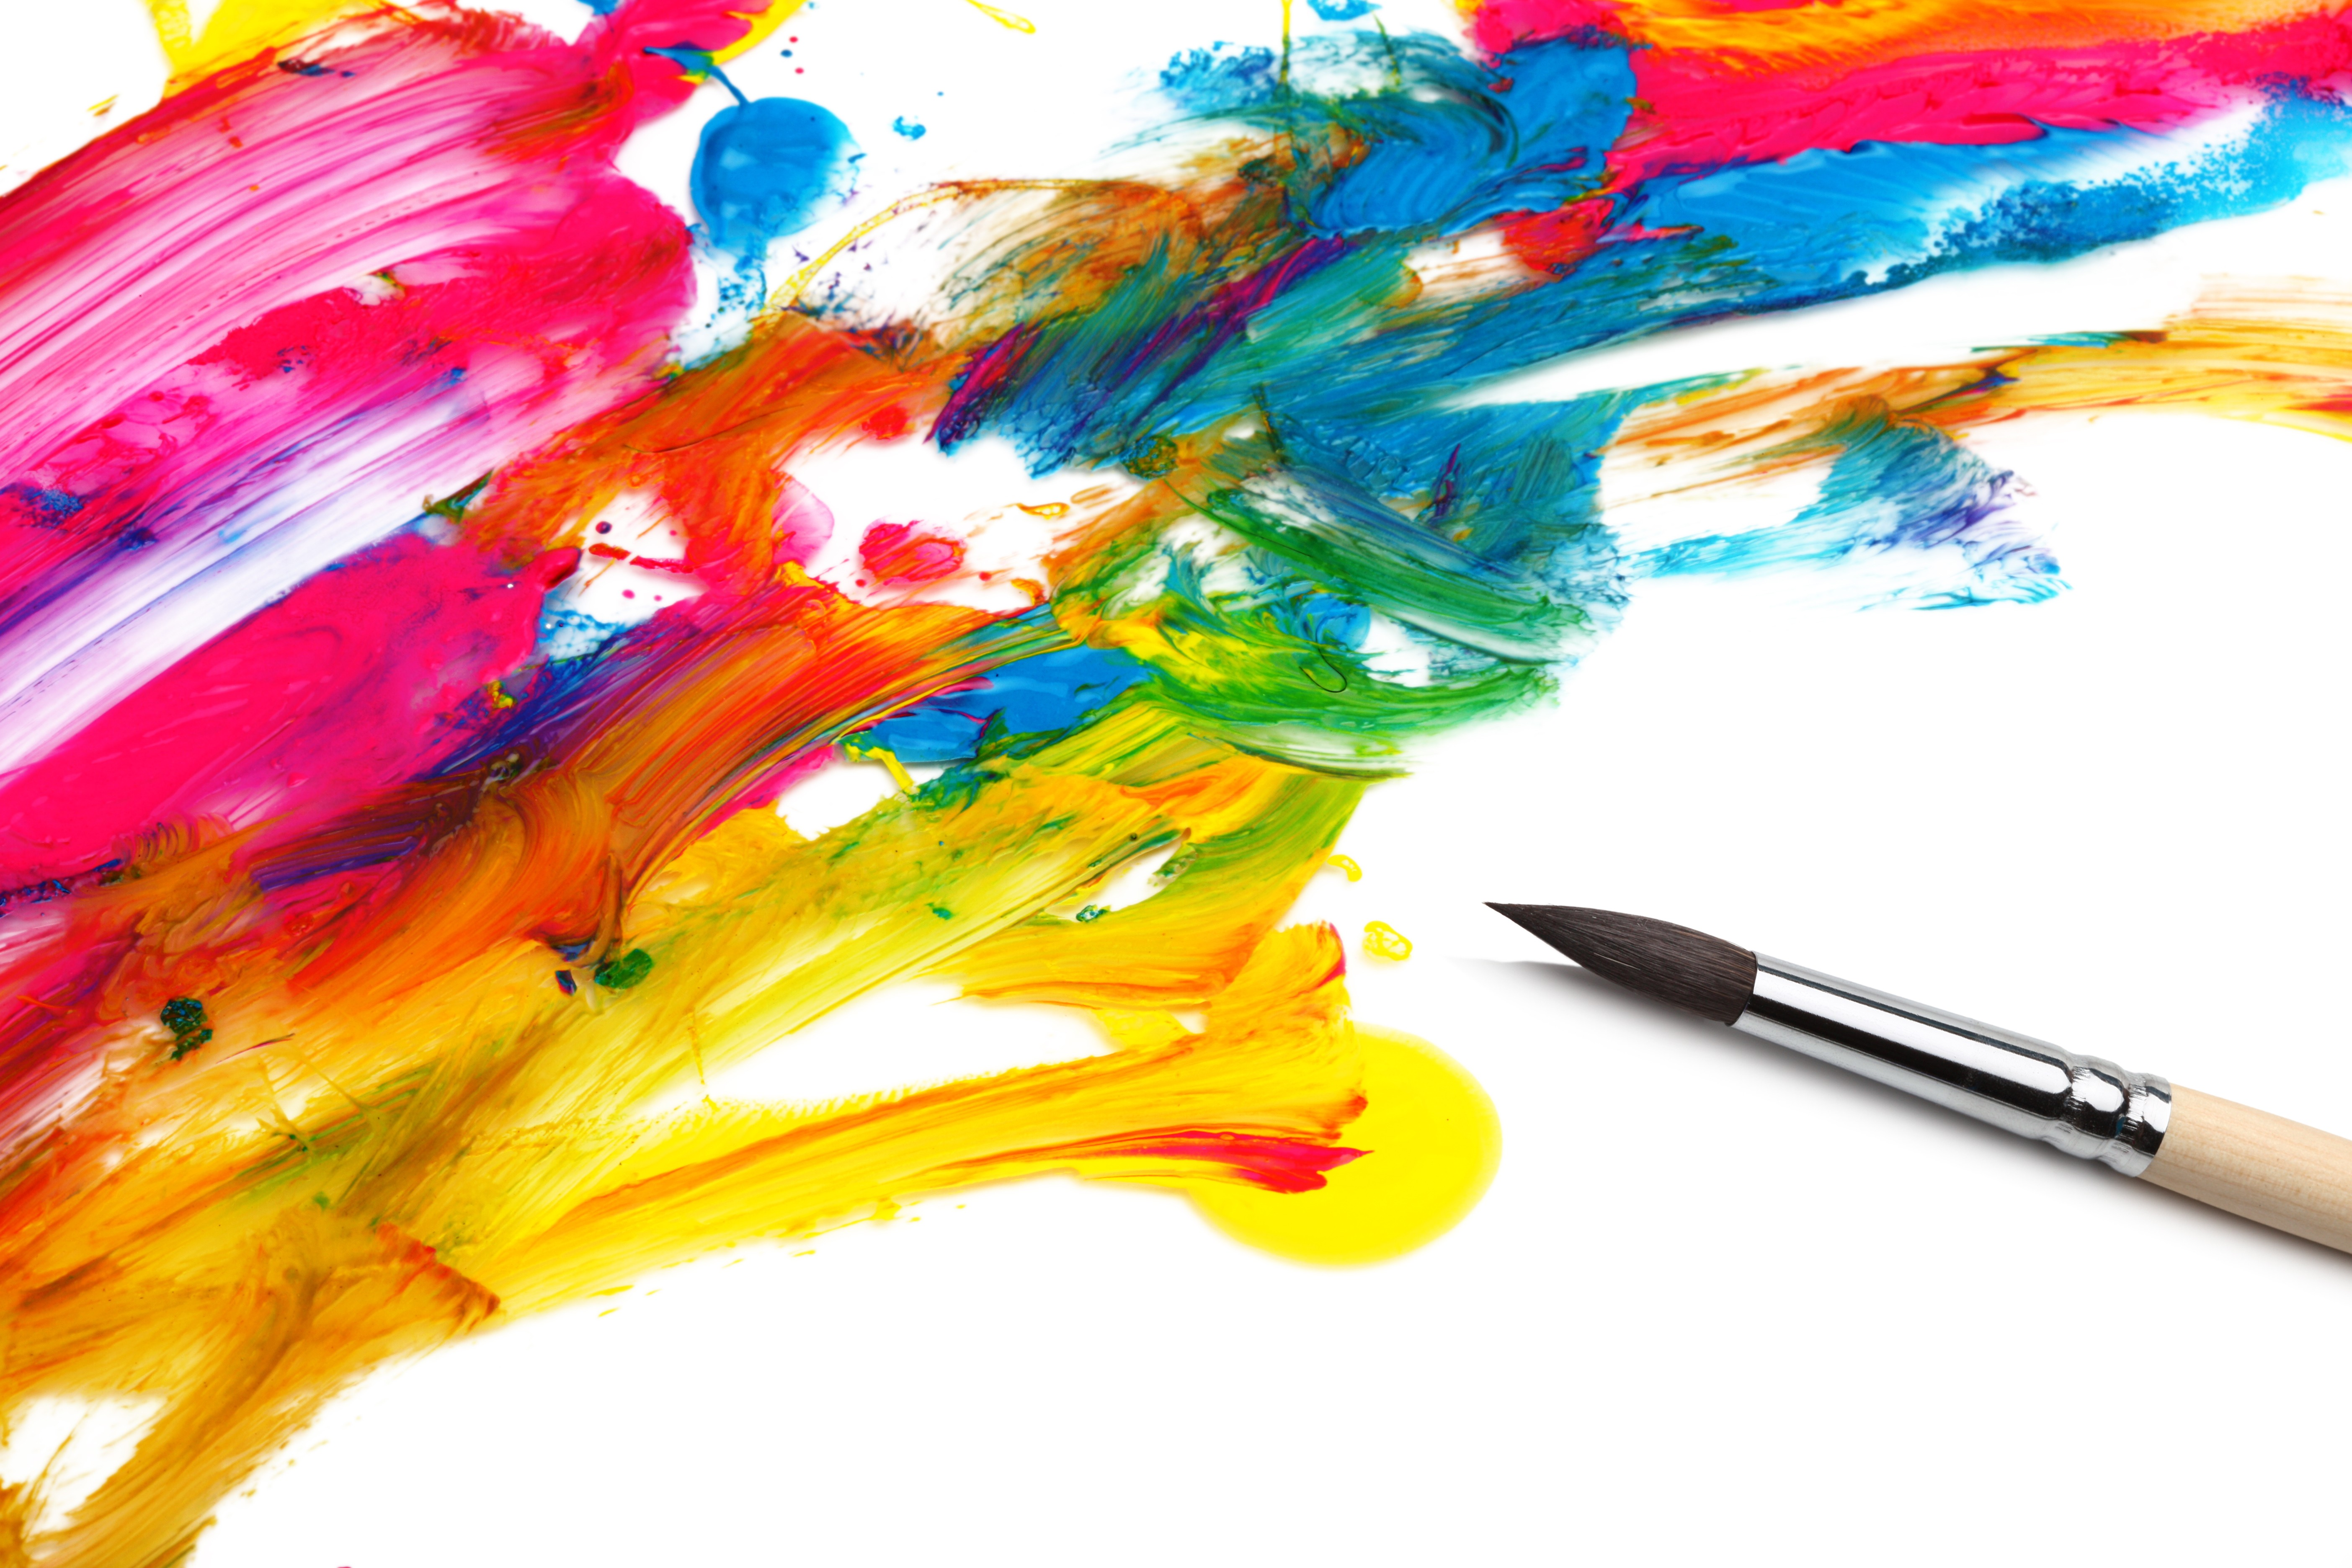 Colorful Art HD Wallpaper   New HD Wallpapers 5616x3744